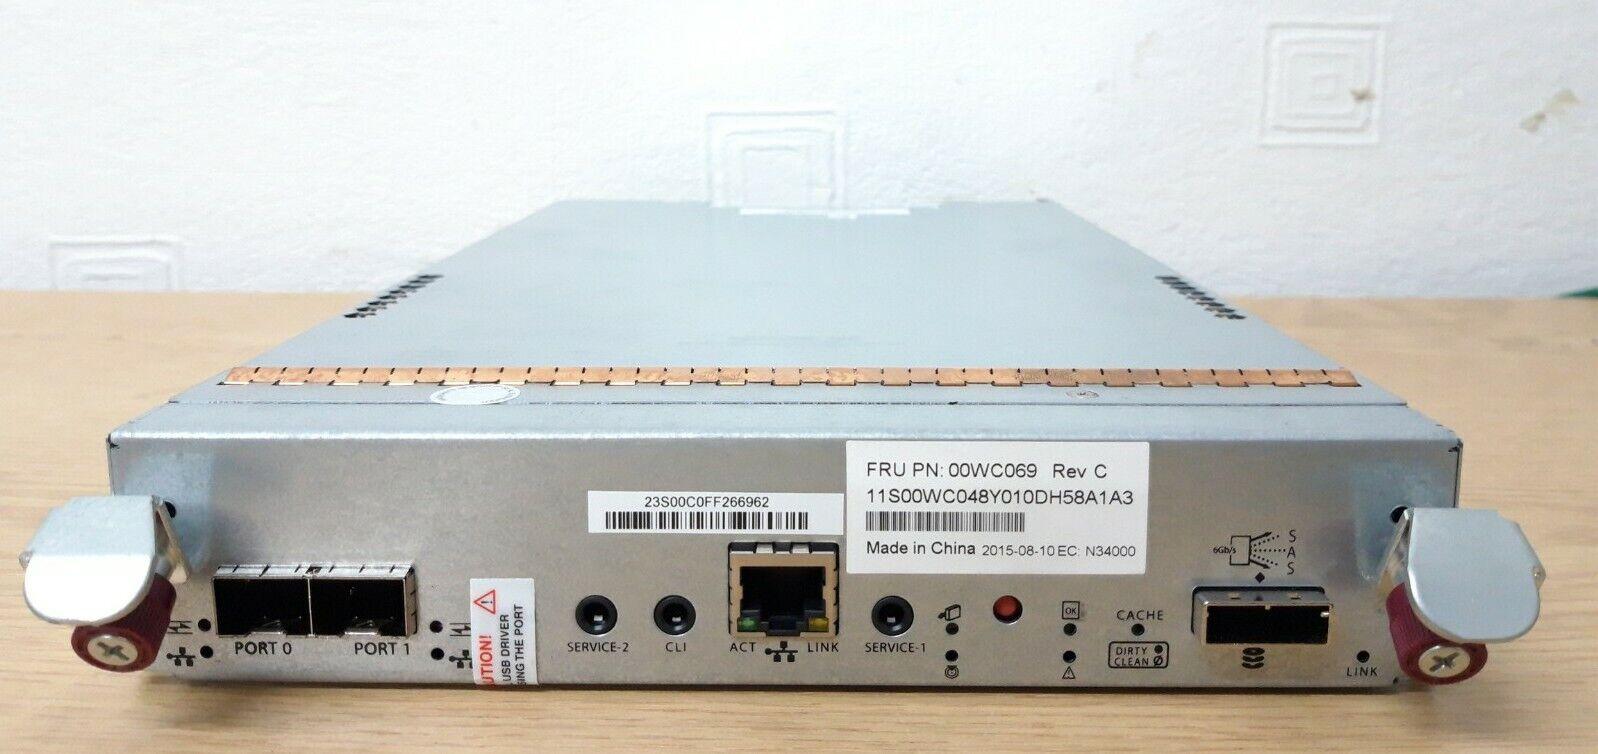 LENOVO STORAGE FC/ISCSI RAID CONTROLLER FOR S2200 00WC069 81-00000078-00-07